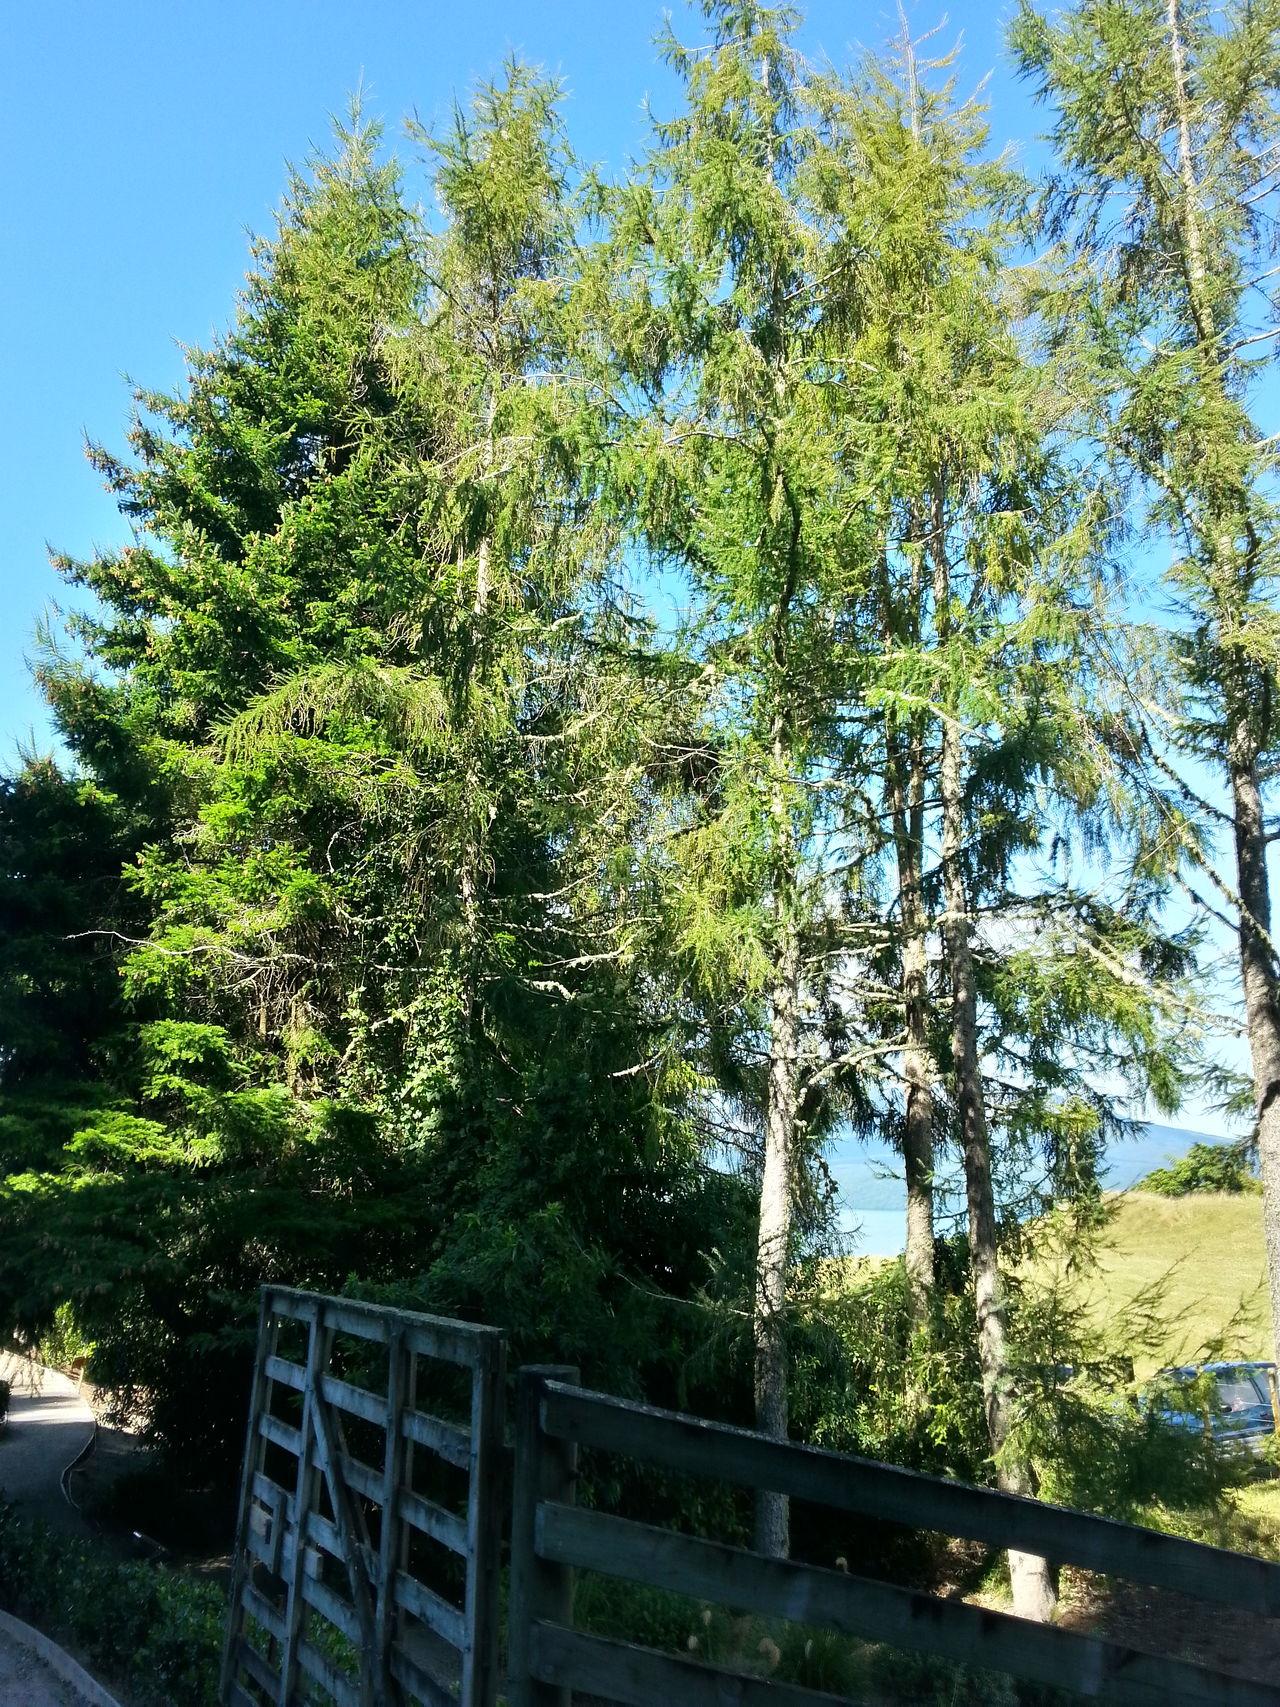 Autumn in New Zealand. New Zealand Scenery Trees